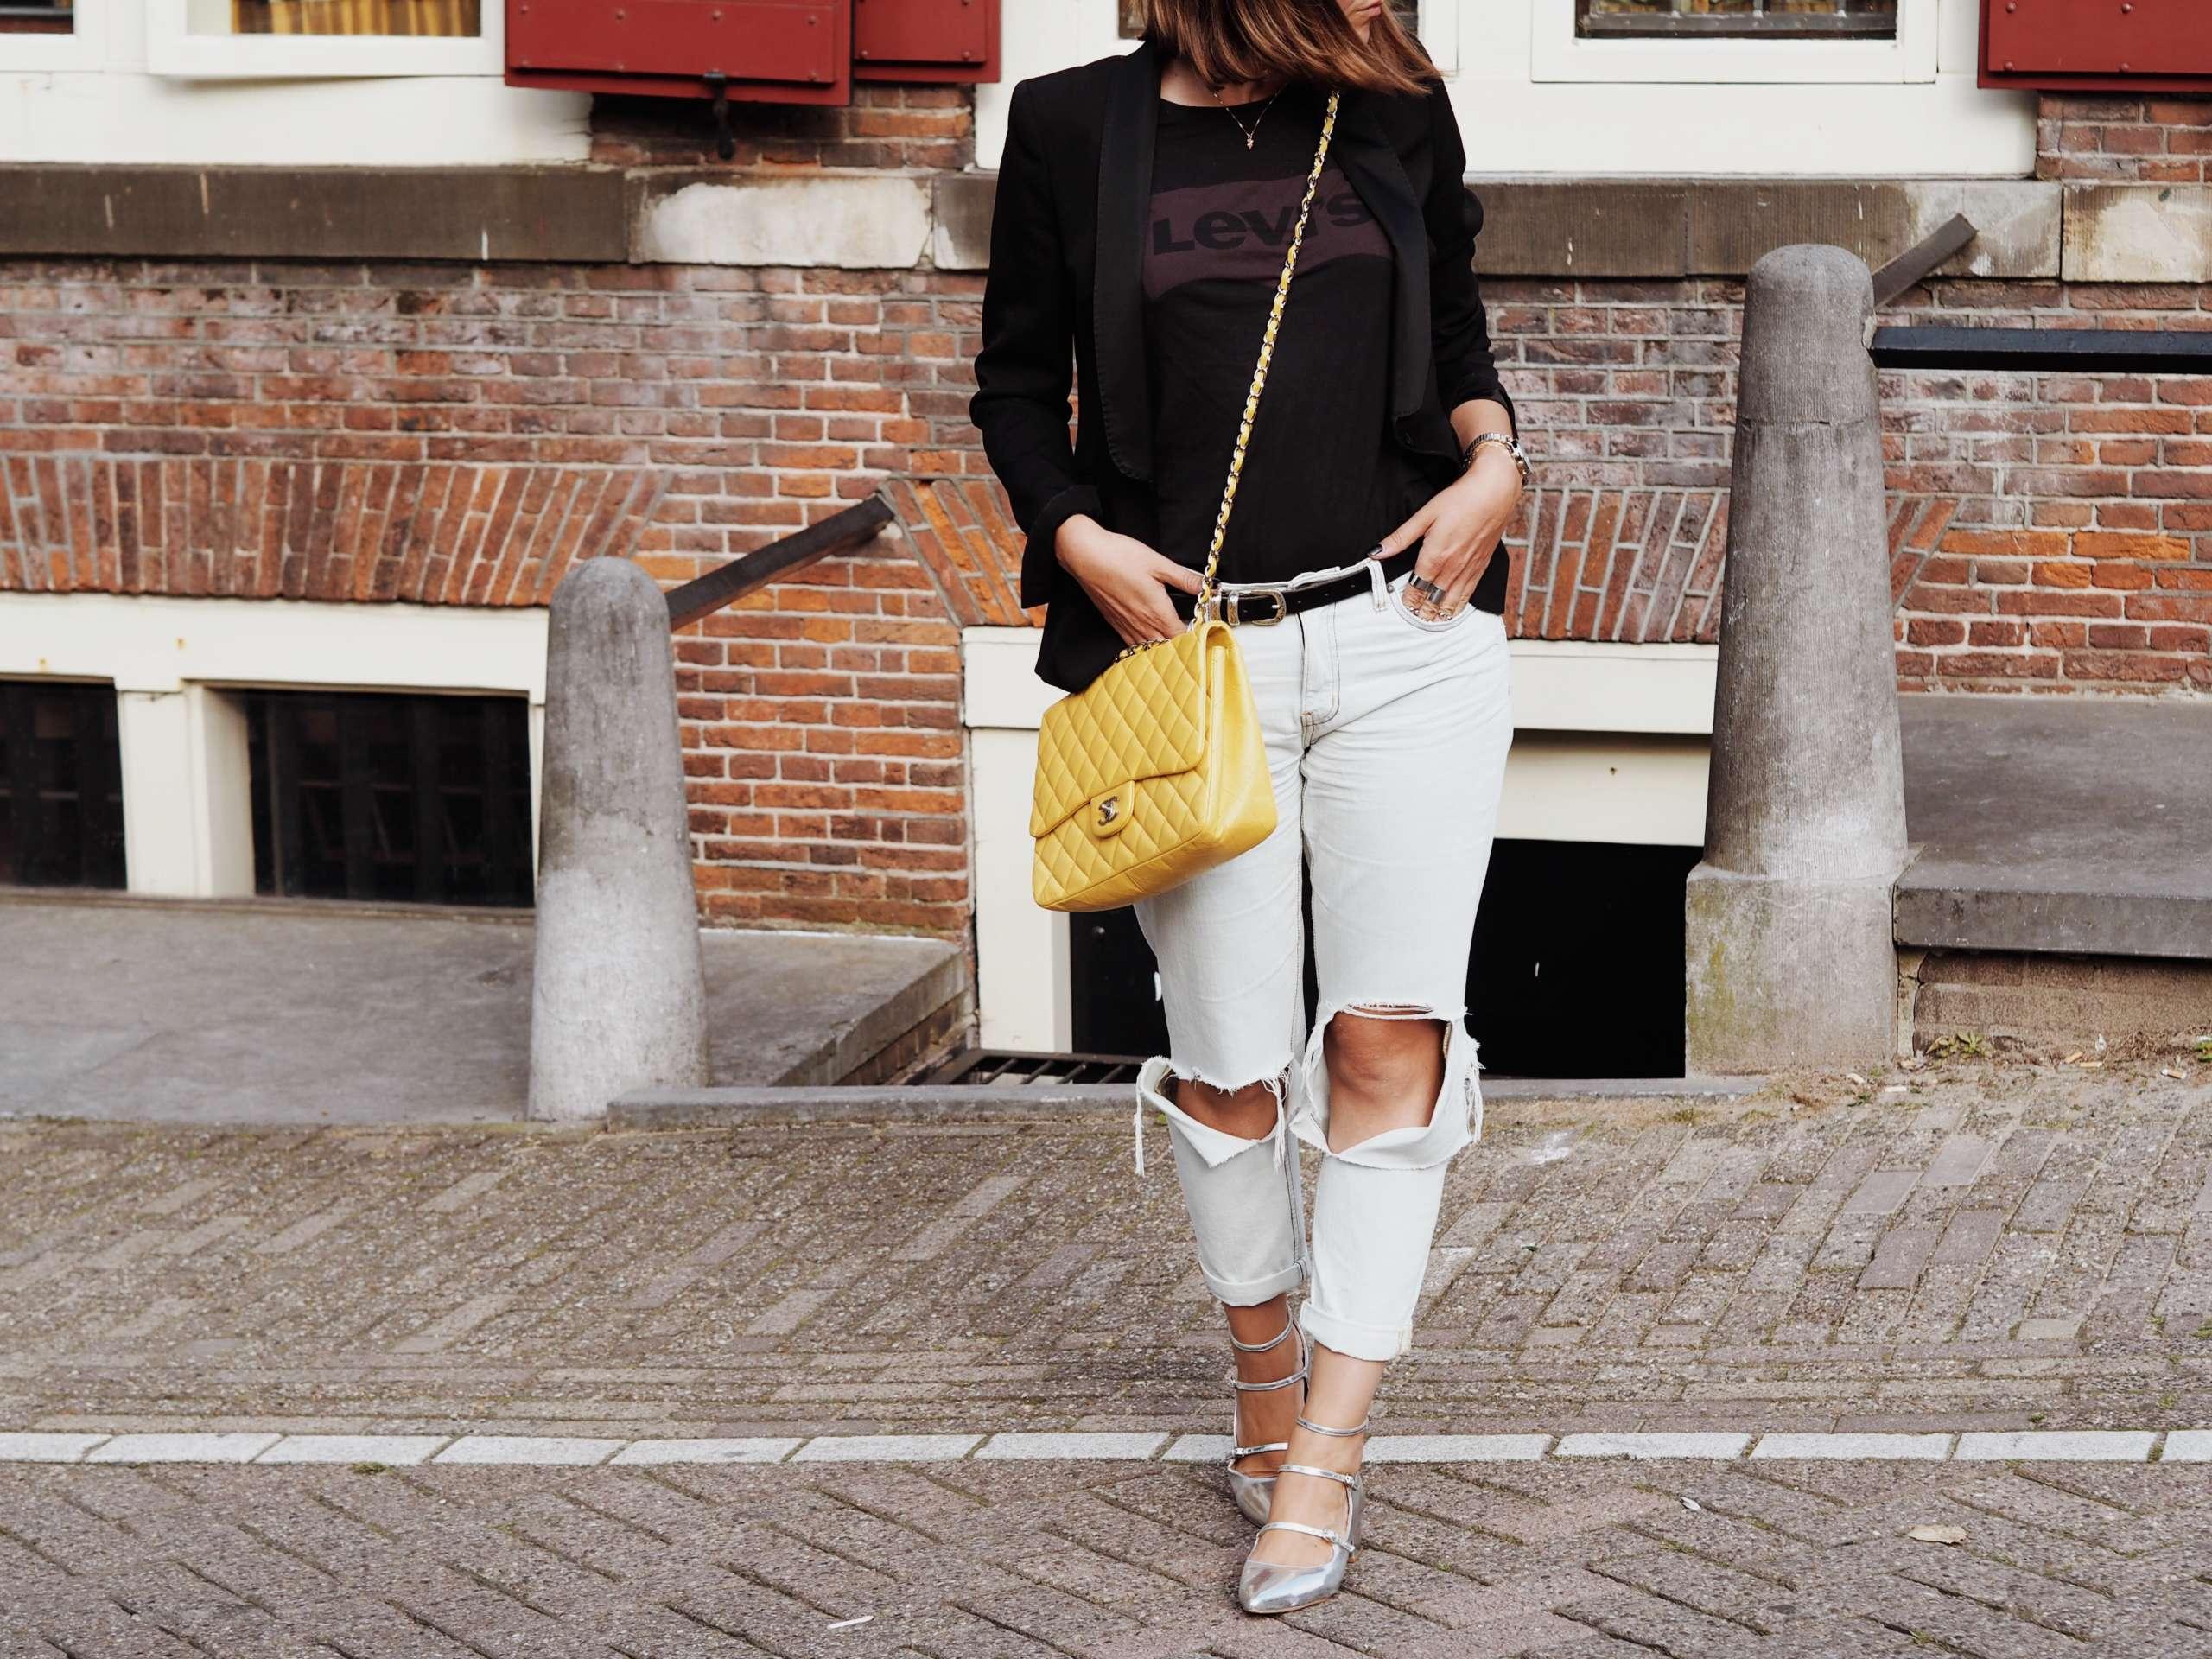 chanel-designer-vintage-back-to-school-lfw-fall-fashion-publicdesire-dricoper-Xlevis-triwa-thpshop